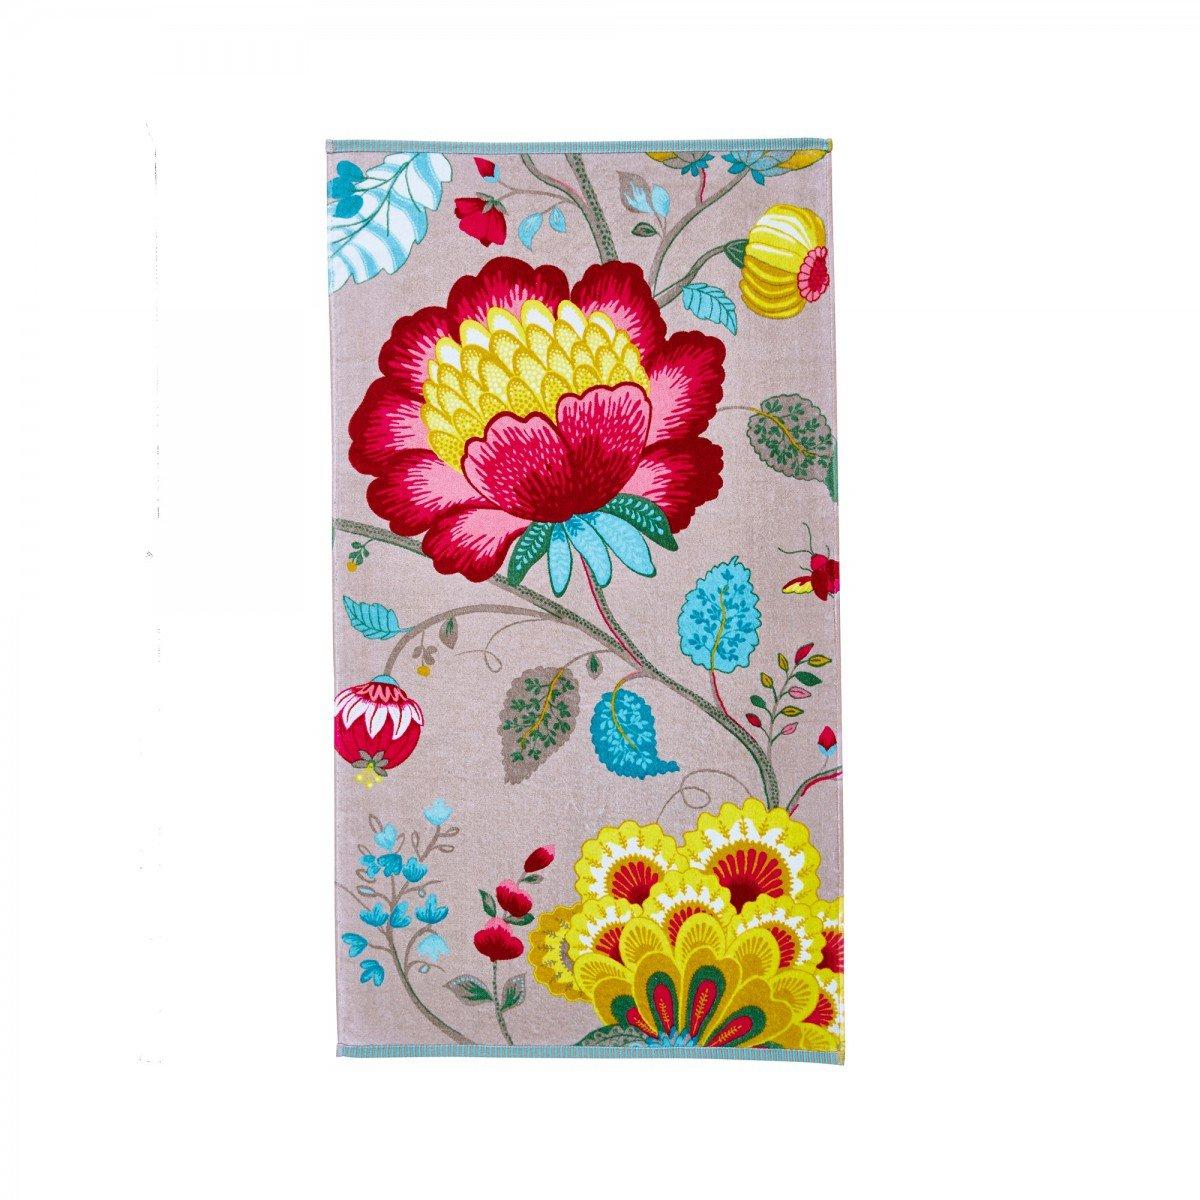 Pip Studio 260256201001 Floral Fantasy-Toalla algodón, 30 x 50 cm, 100% algodón, blanco, 30 x 50 cm